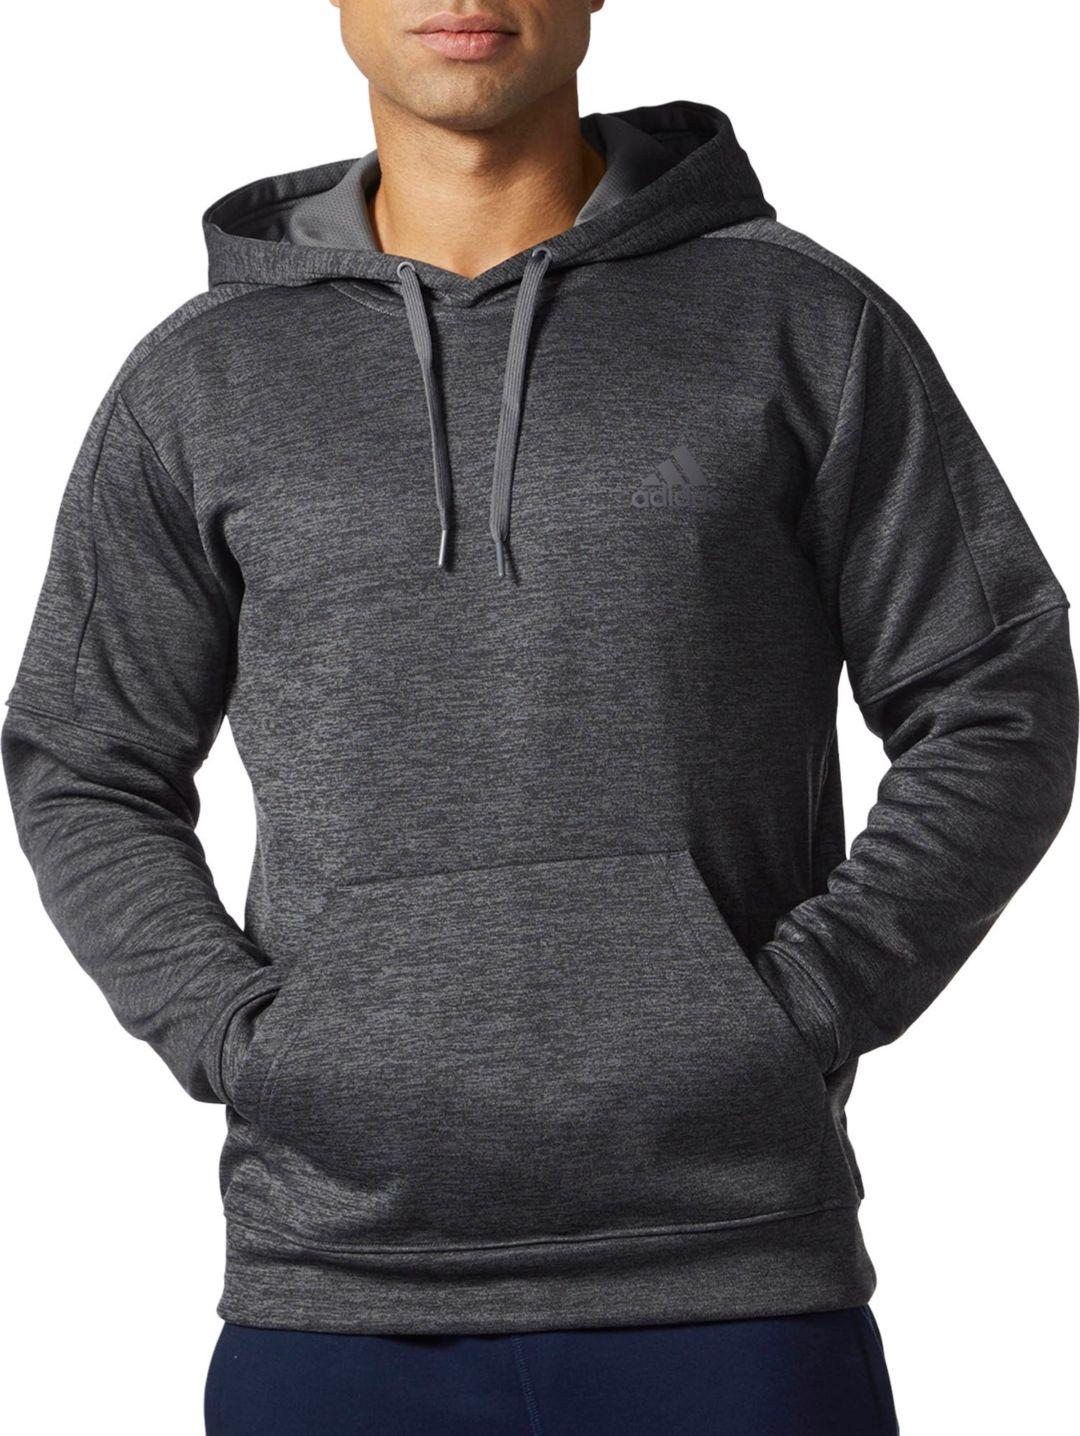 9a1d736b adidas Men's Team Issue Fleece Hoodie | DICK'S Sporting Goods